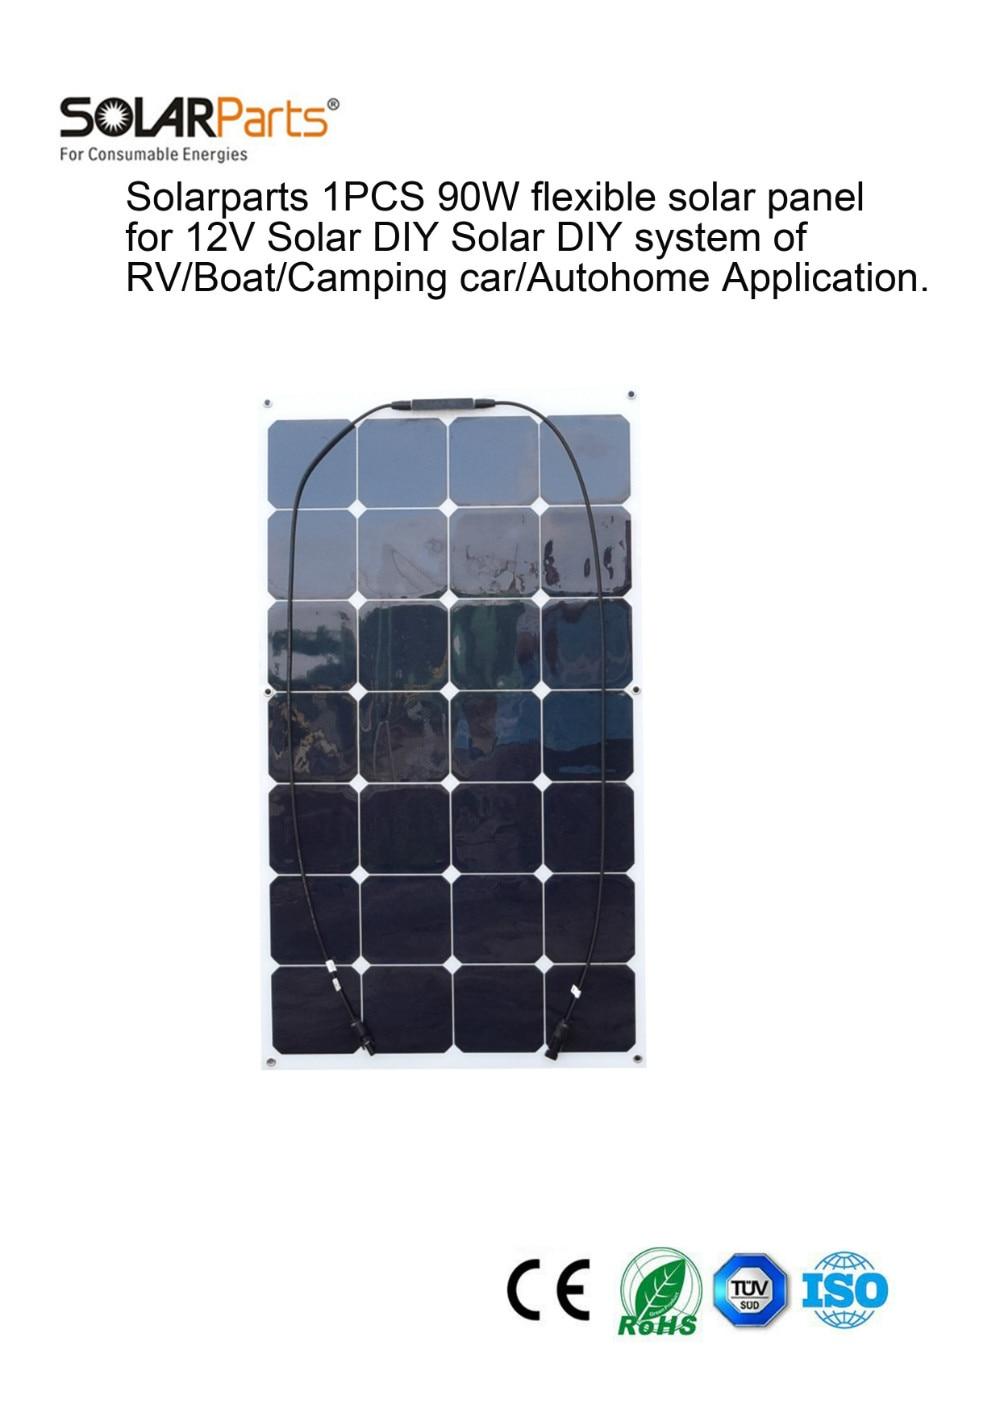 Solarparts 1PCS 90W flexible solar panel 12V cell module system kits yacht boat RV outdoor Sun